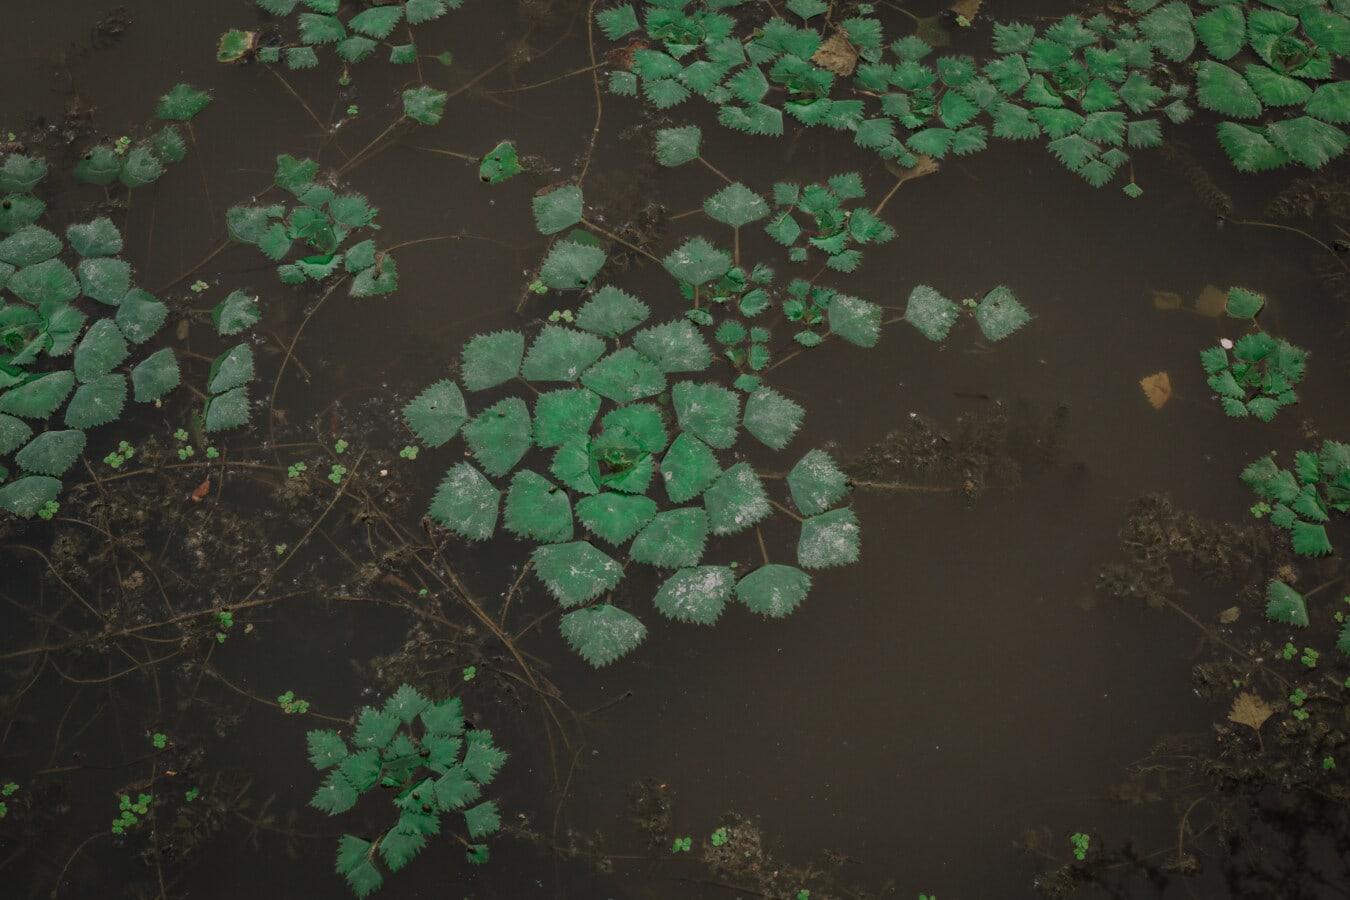 aquatische, Wasserpflanze, Ökosystem, Blatt, dunkelgrün, Textur, Oberfläche, nass, Farbe, Biologie